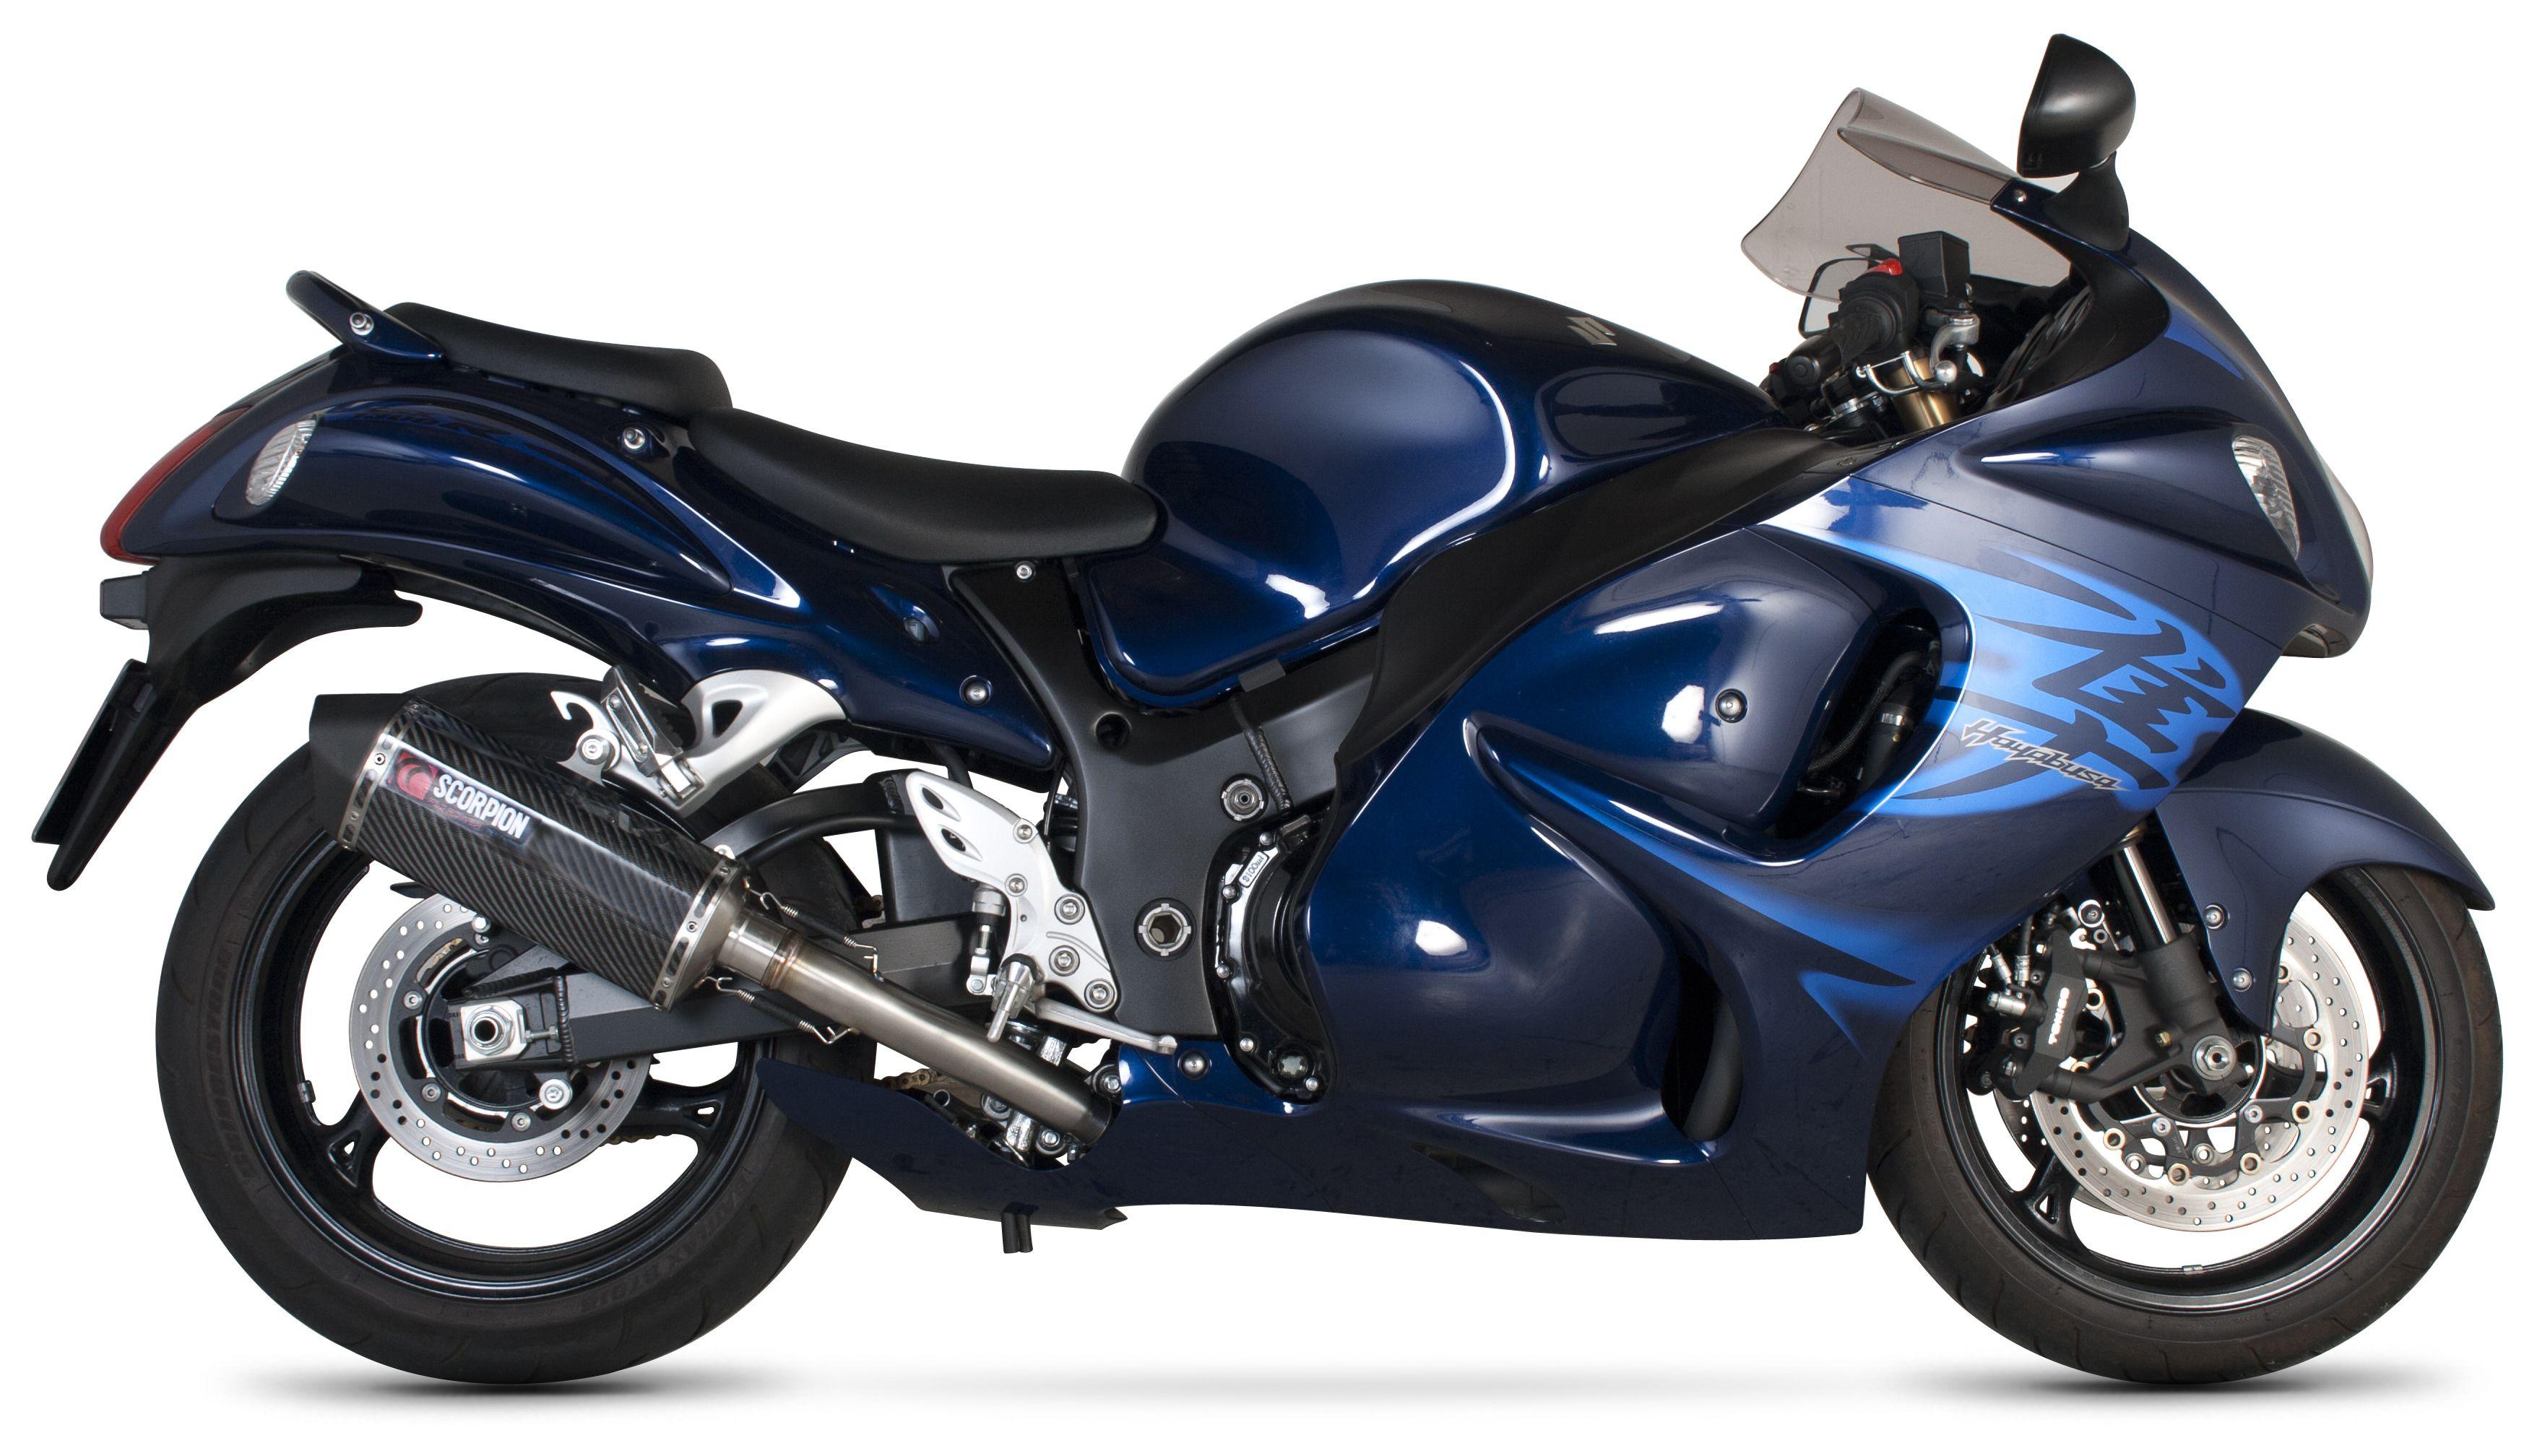 Suzuki Grand Vitara Fuse Box Diagram Diy Wiring Diagrams Motorcycle And Relay